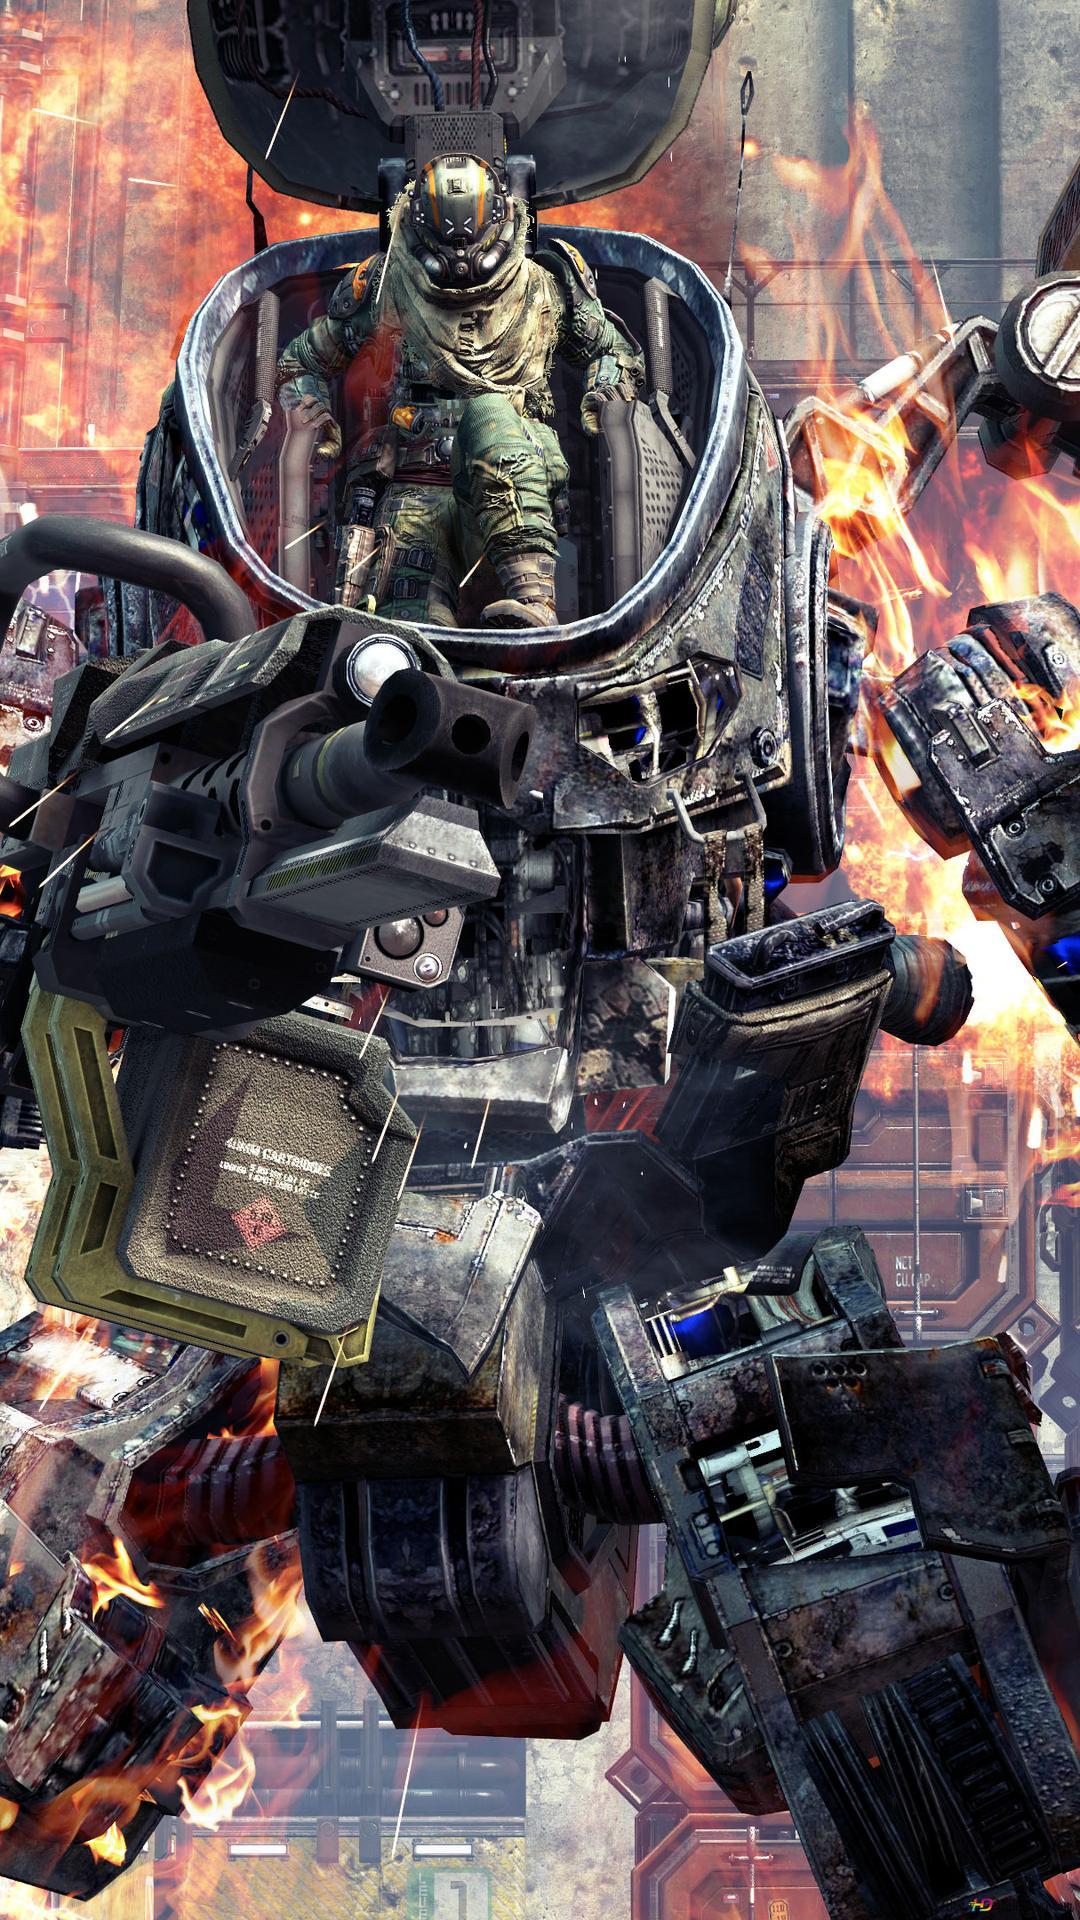 Titanfall 2 War Robots Hd Wallpaper Download